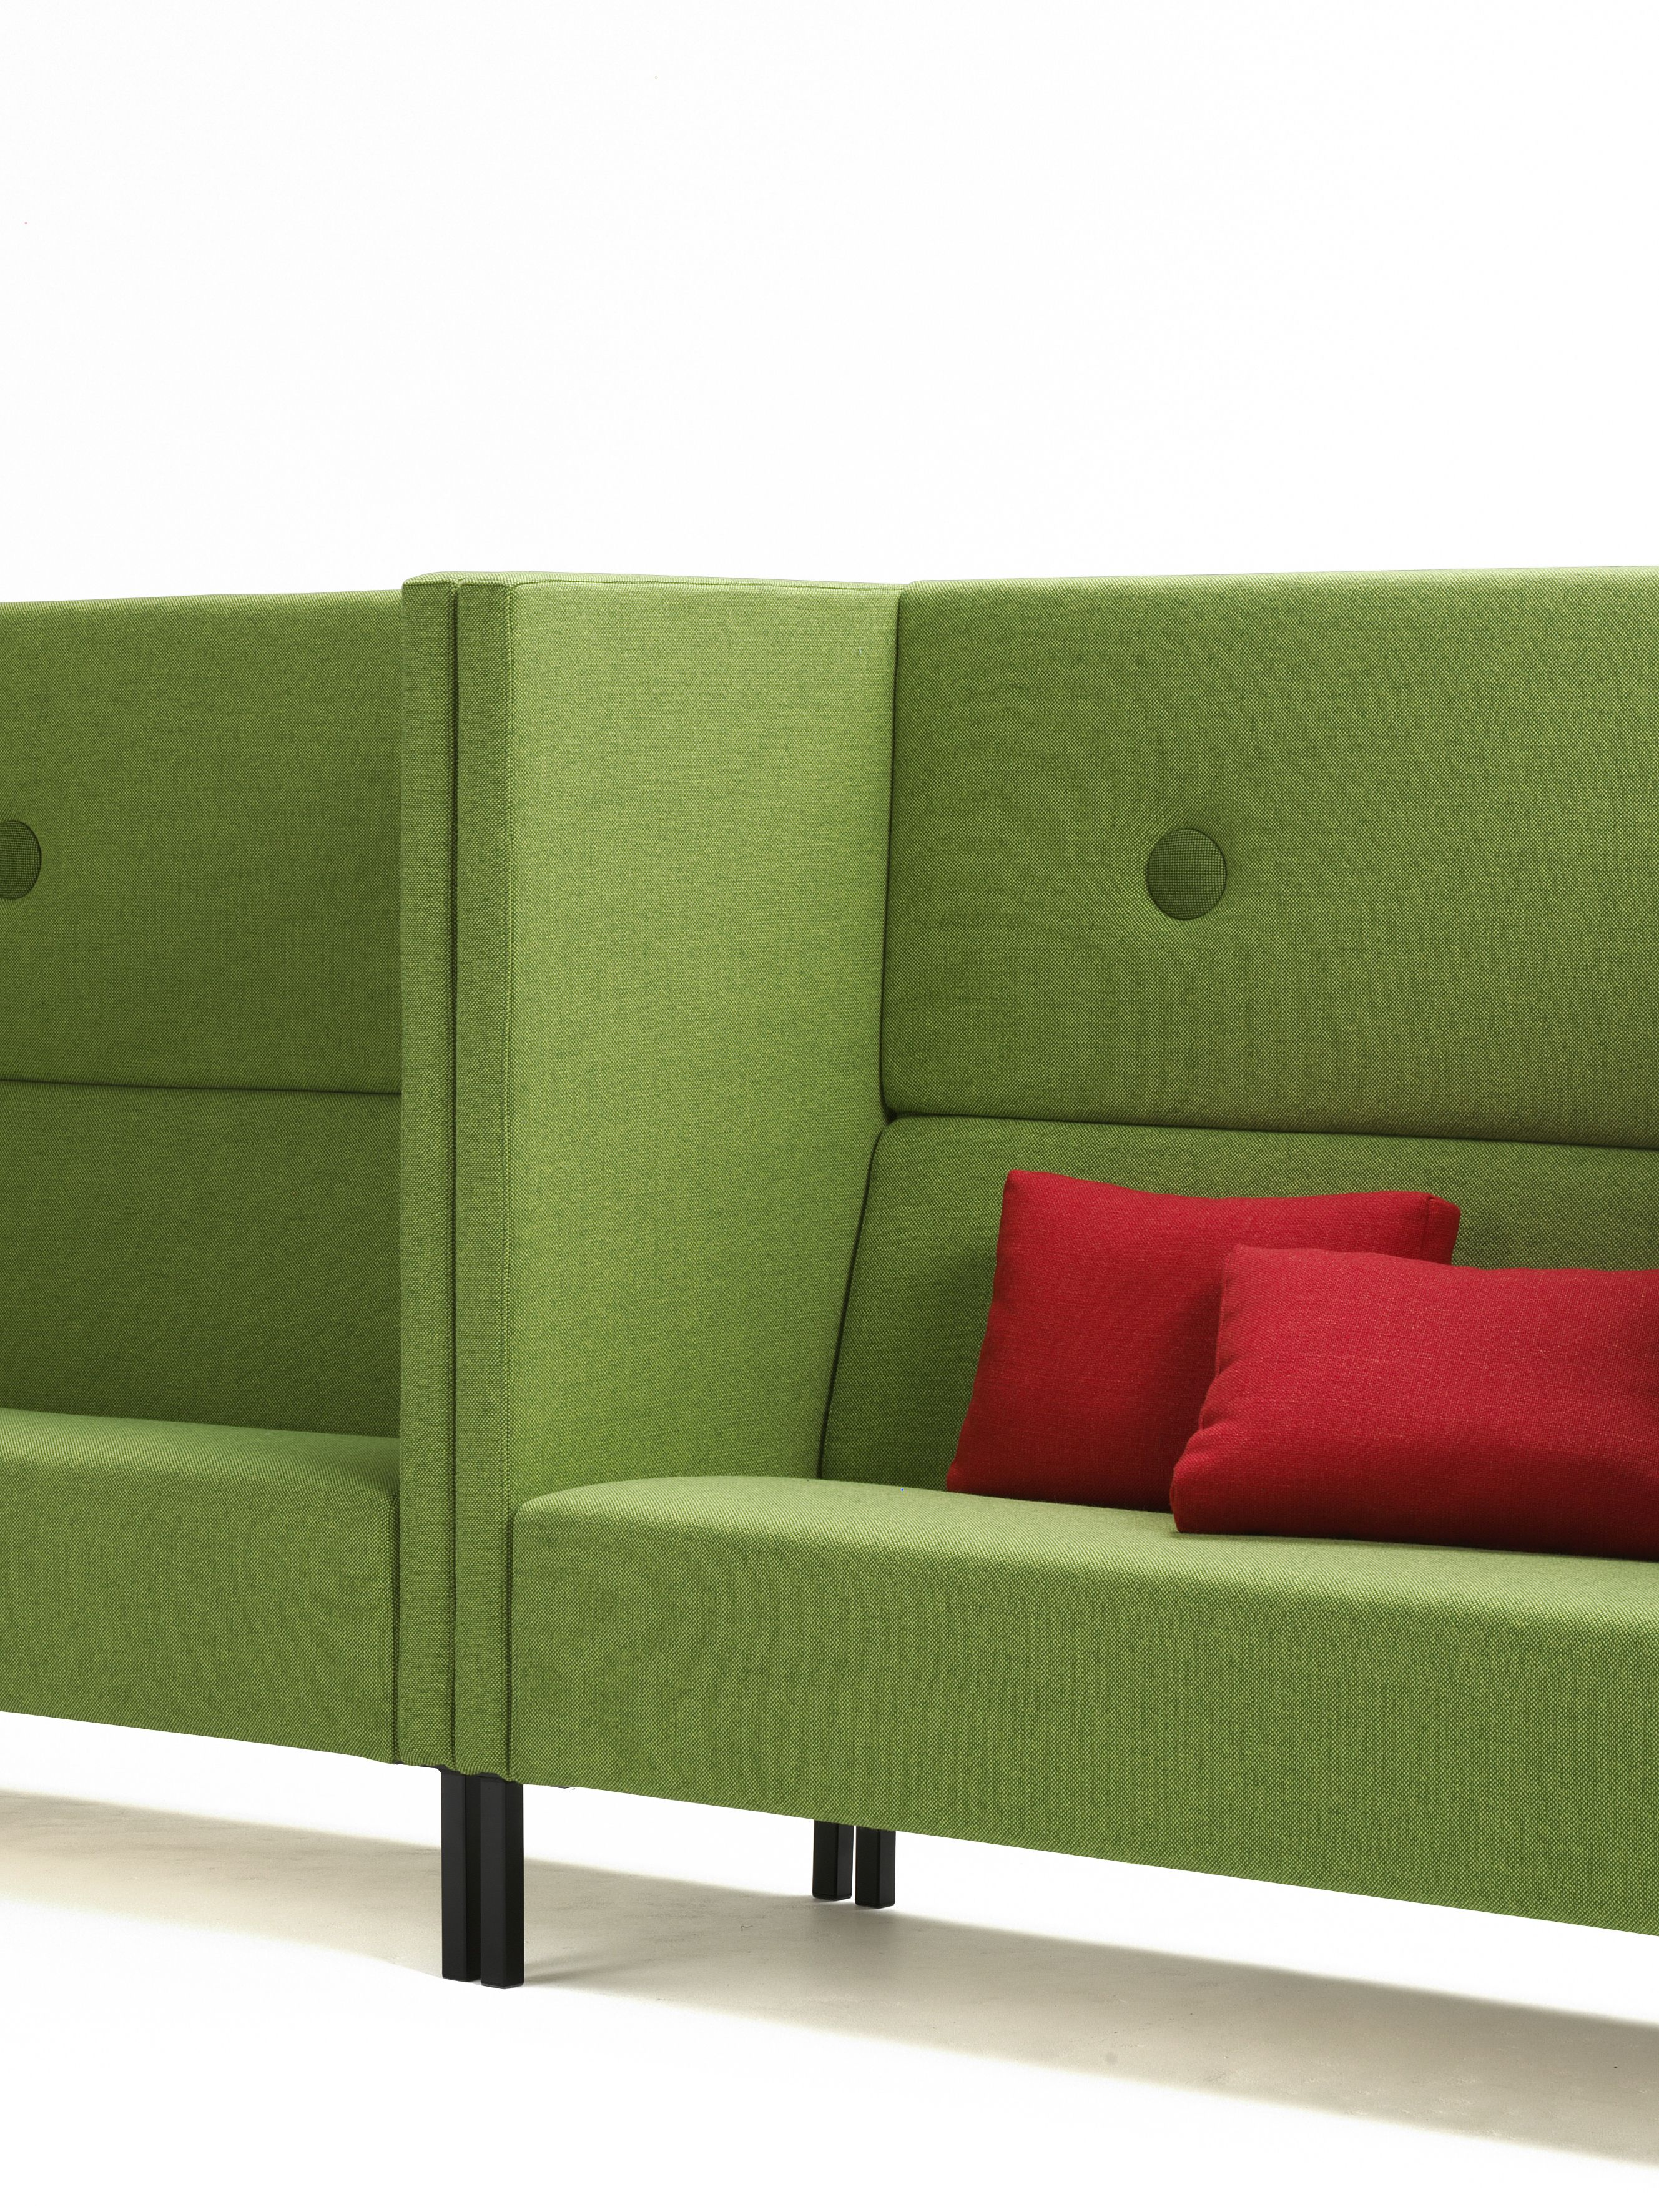 Martela pod breakout seating http: www.wharfside.co.uk office